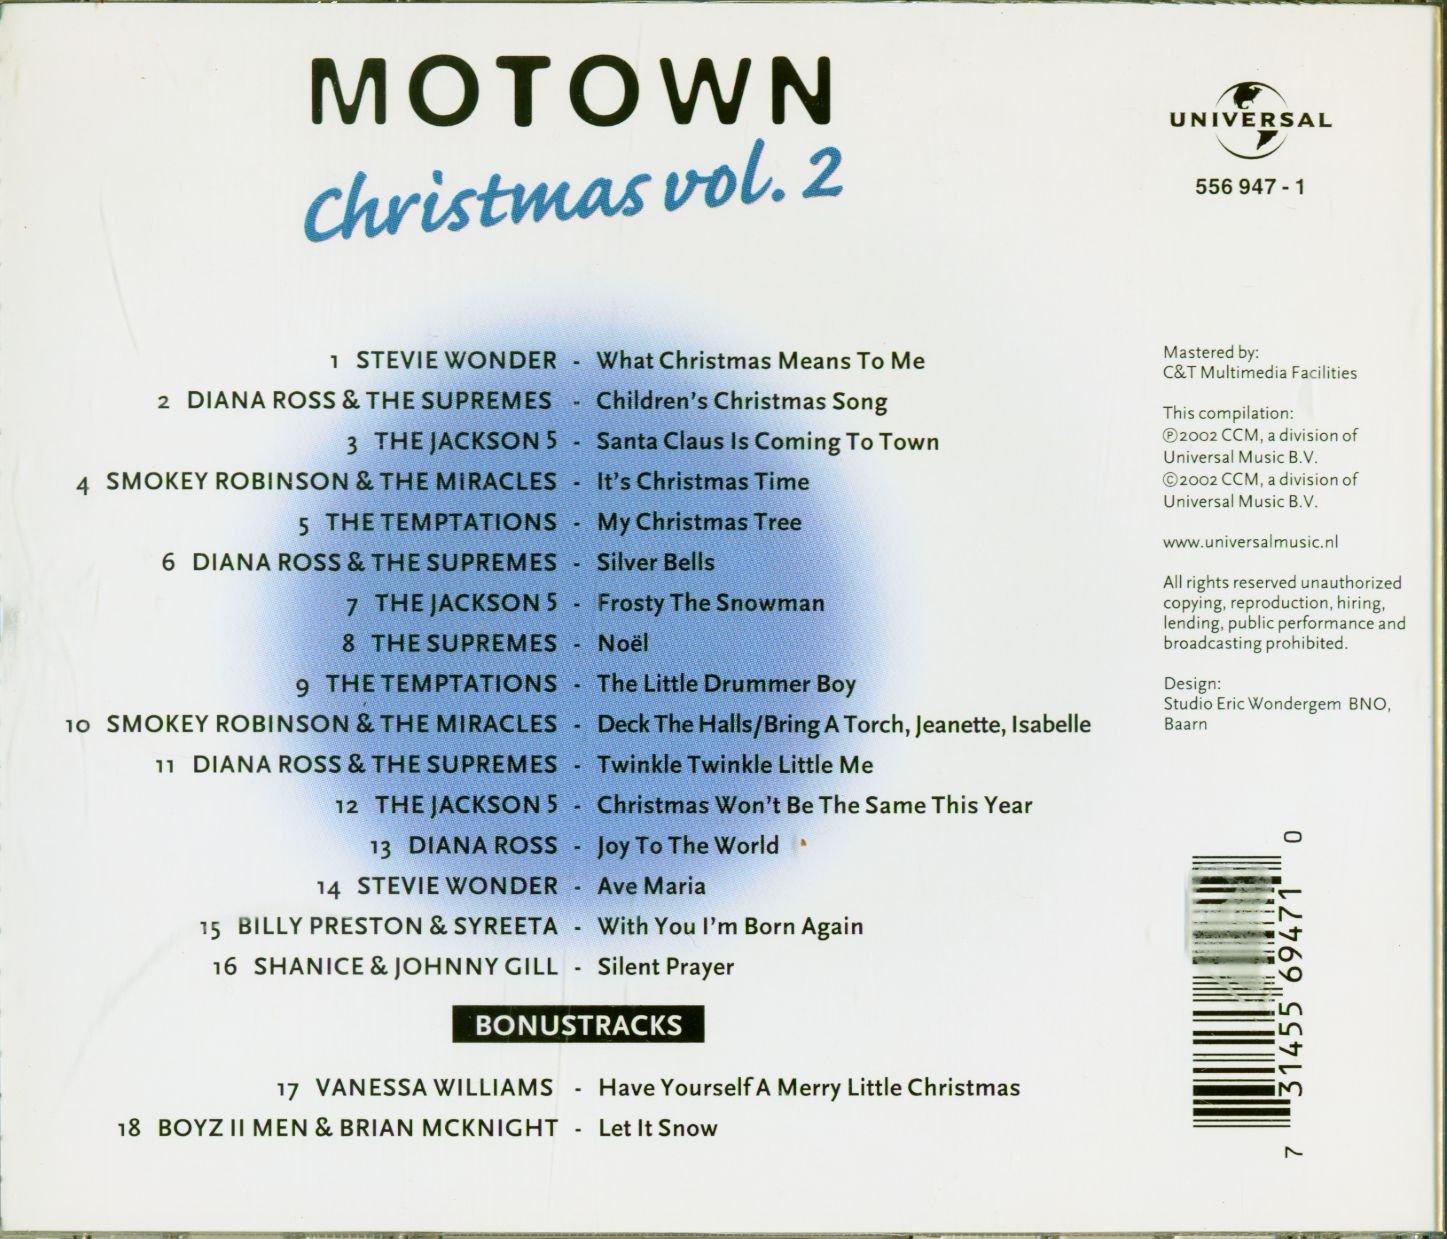 Motown Christmas Vol.2 - Amazon.com Music